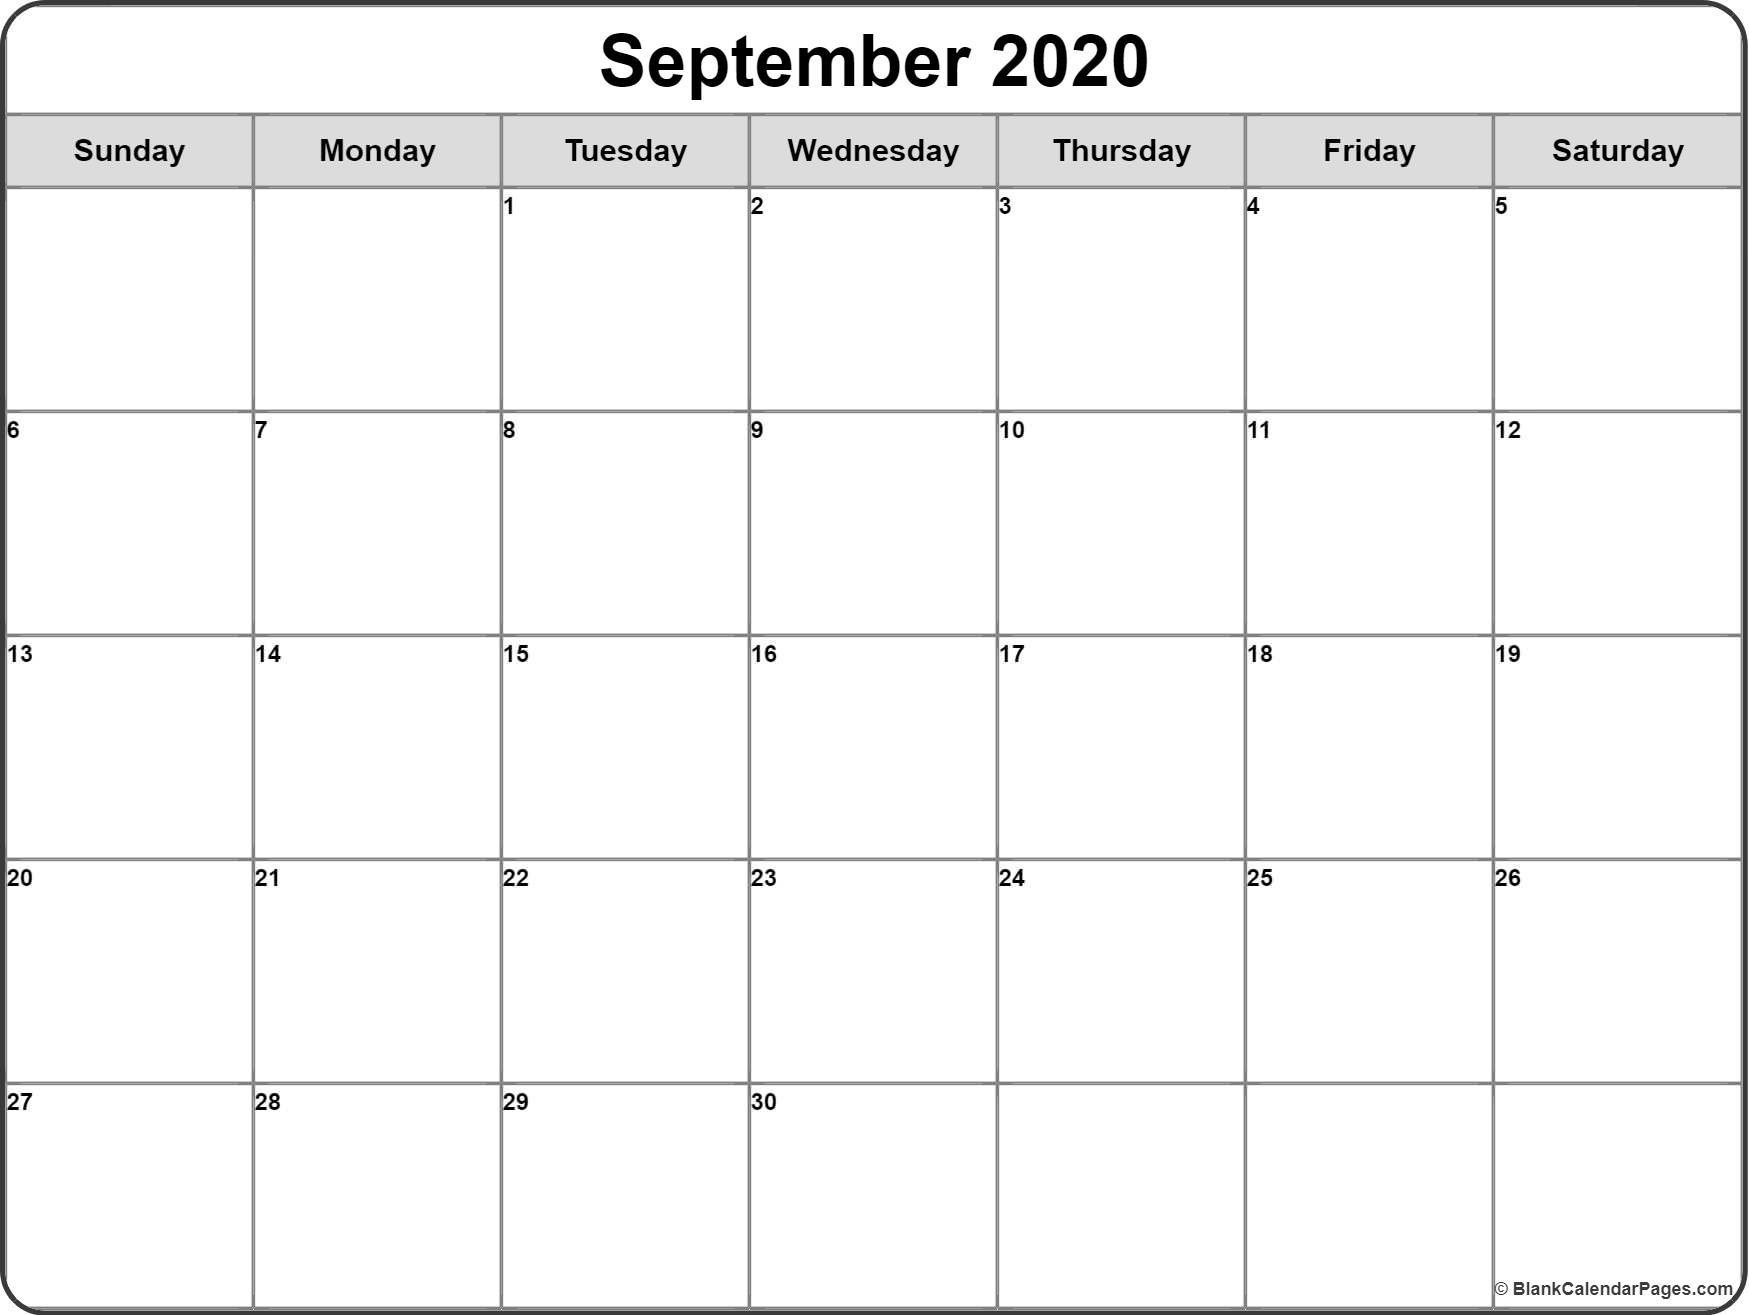 September 2020 Calendar | Free Printable Monthly Calendars  Free Printable Month Calendar